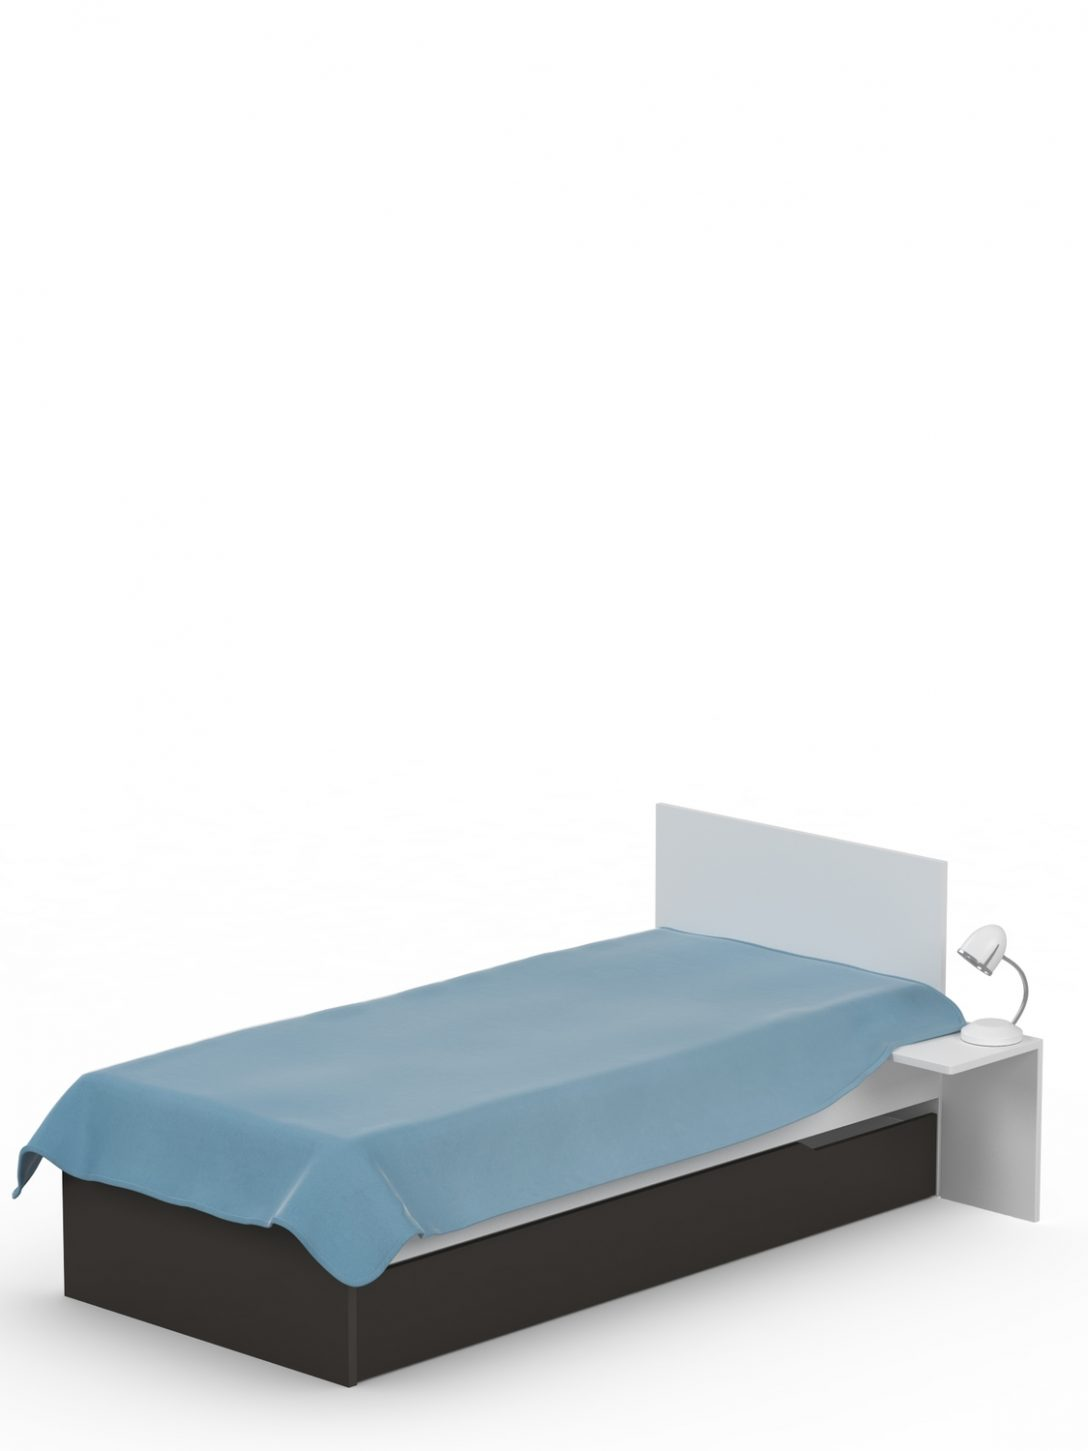 Large Size of Bett 120x200 Uni Dark Meblik Weiß Mit Ausziehbett Hohem Kopfteil Holz Rattan Box Spring Topper Betten Ikea 160x200 Minion Futon Kinder Rückenlehne Stauraum Bett Bett 120x200